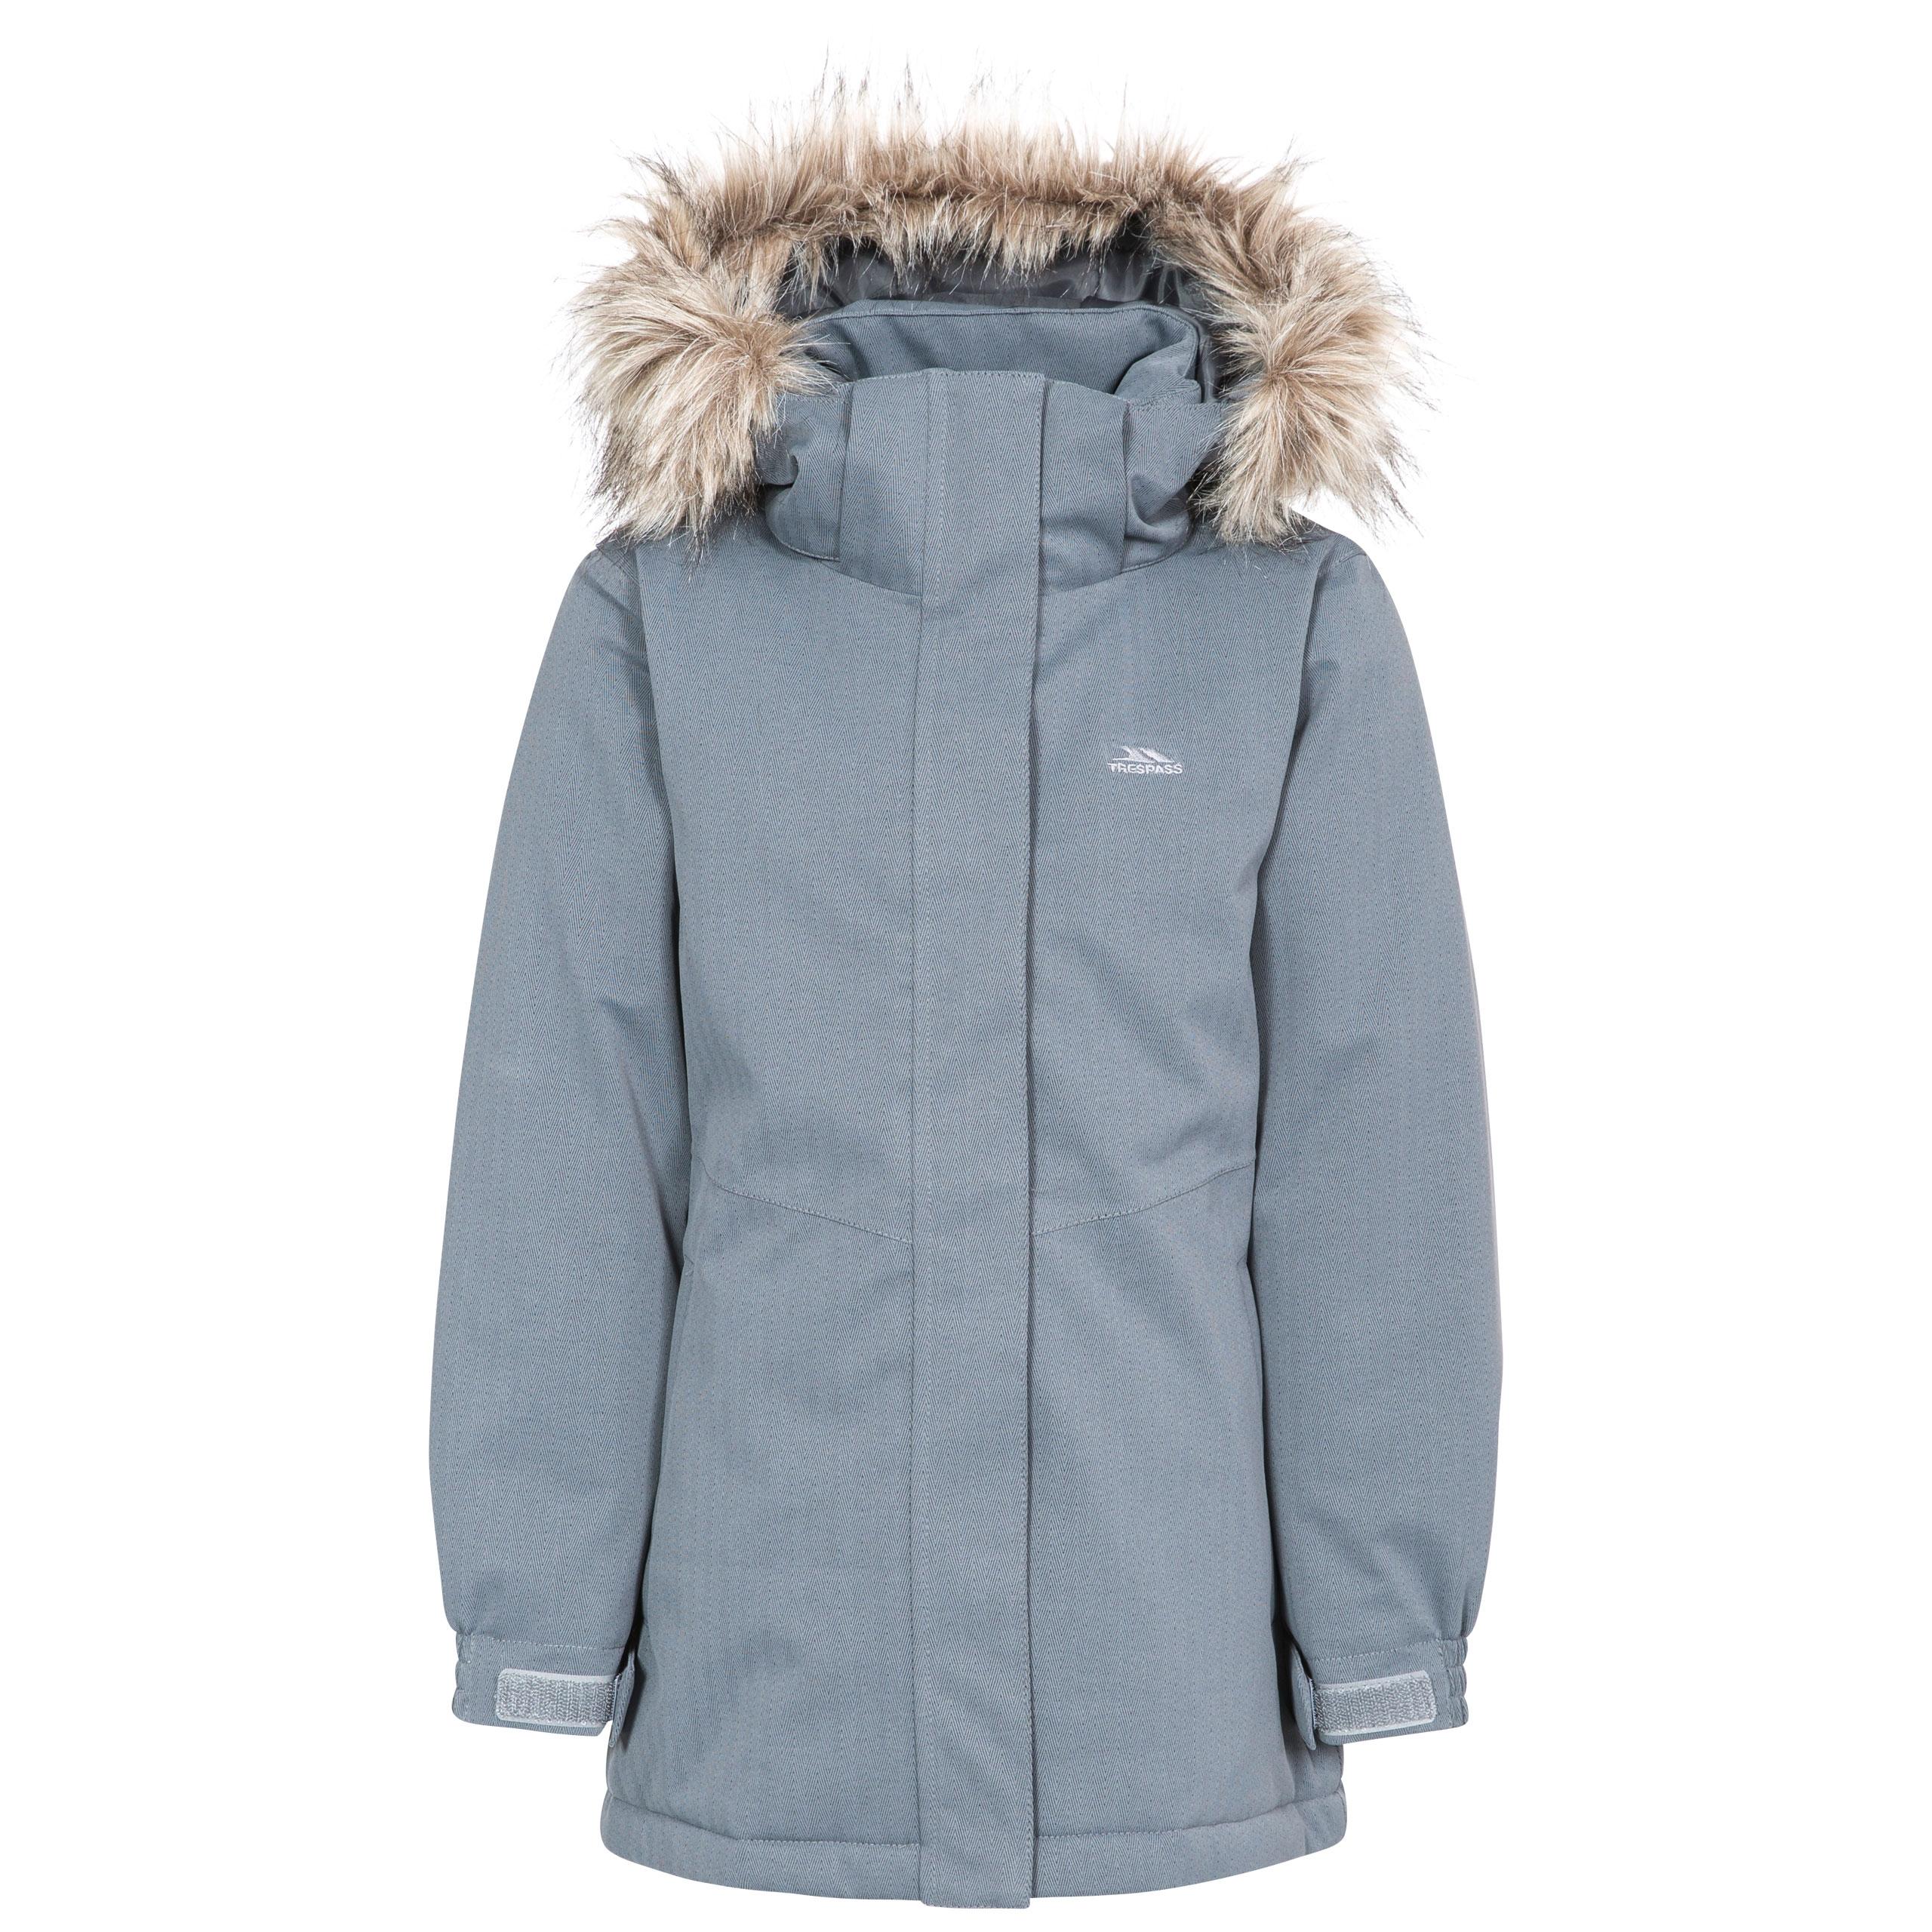 fa5cd82a6 Gardenia Girls' Windproof Insulated Waterproof Parka Jacket   Trespass UK